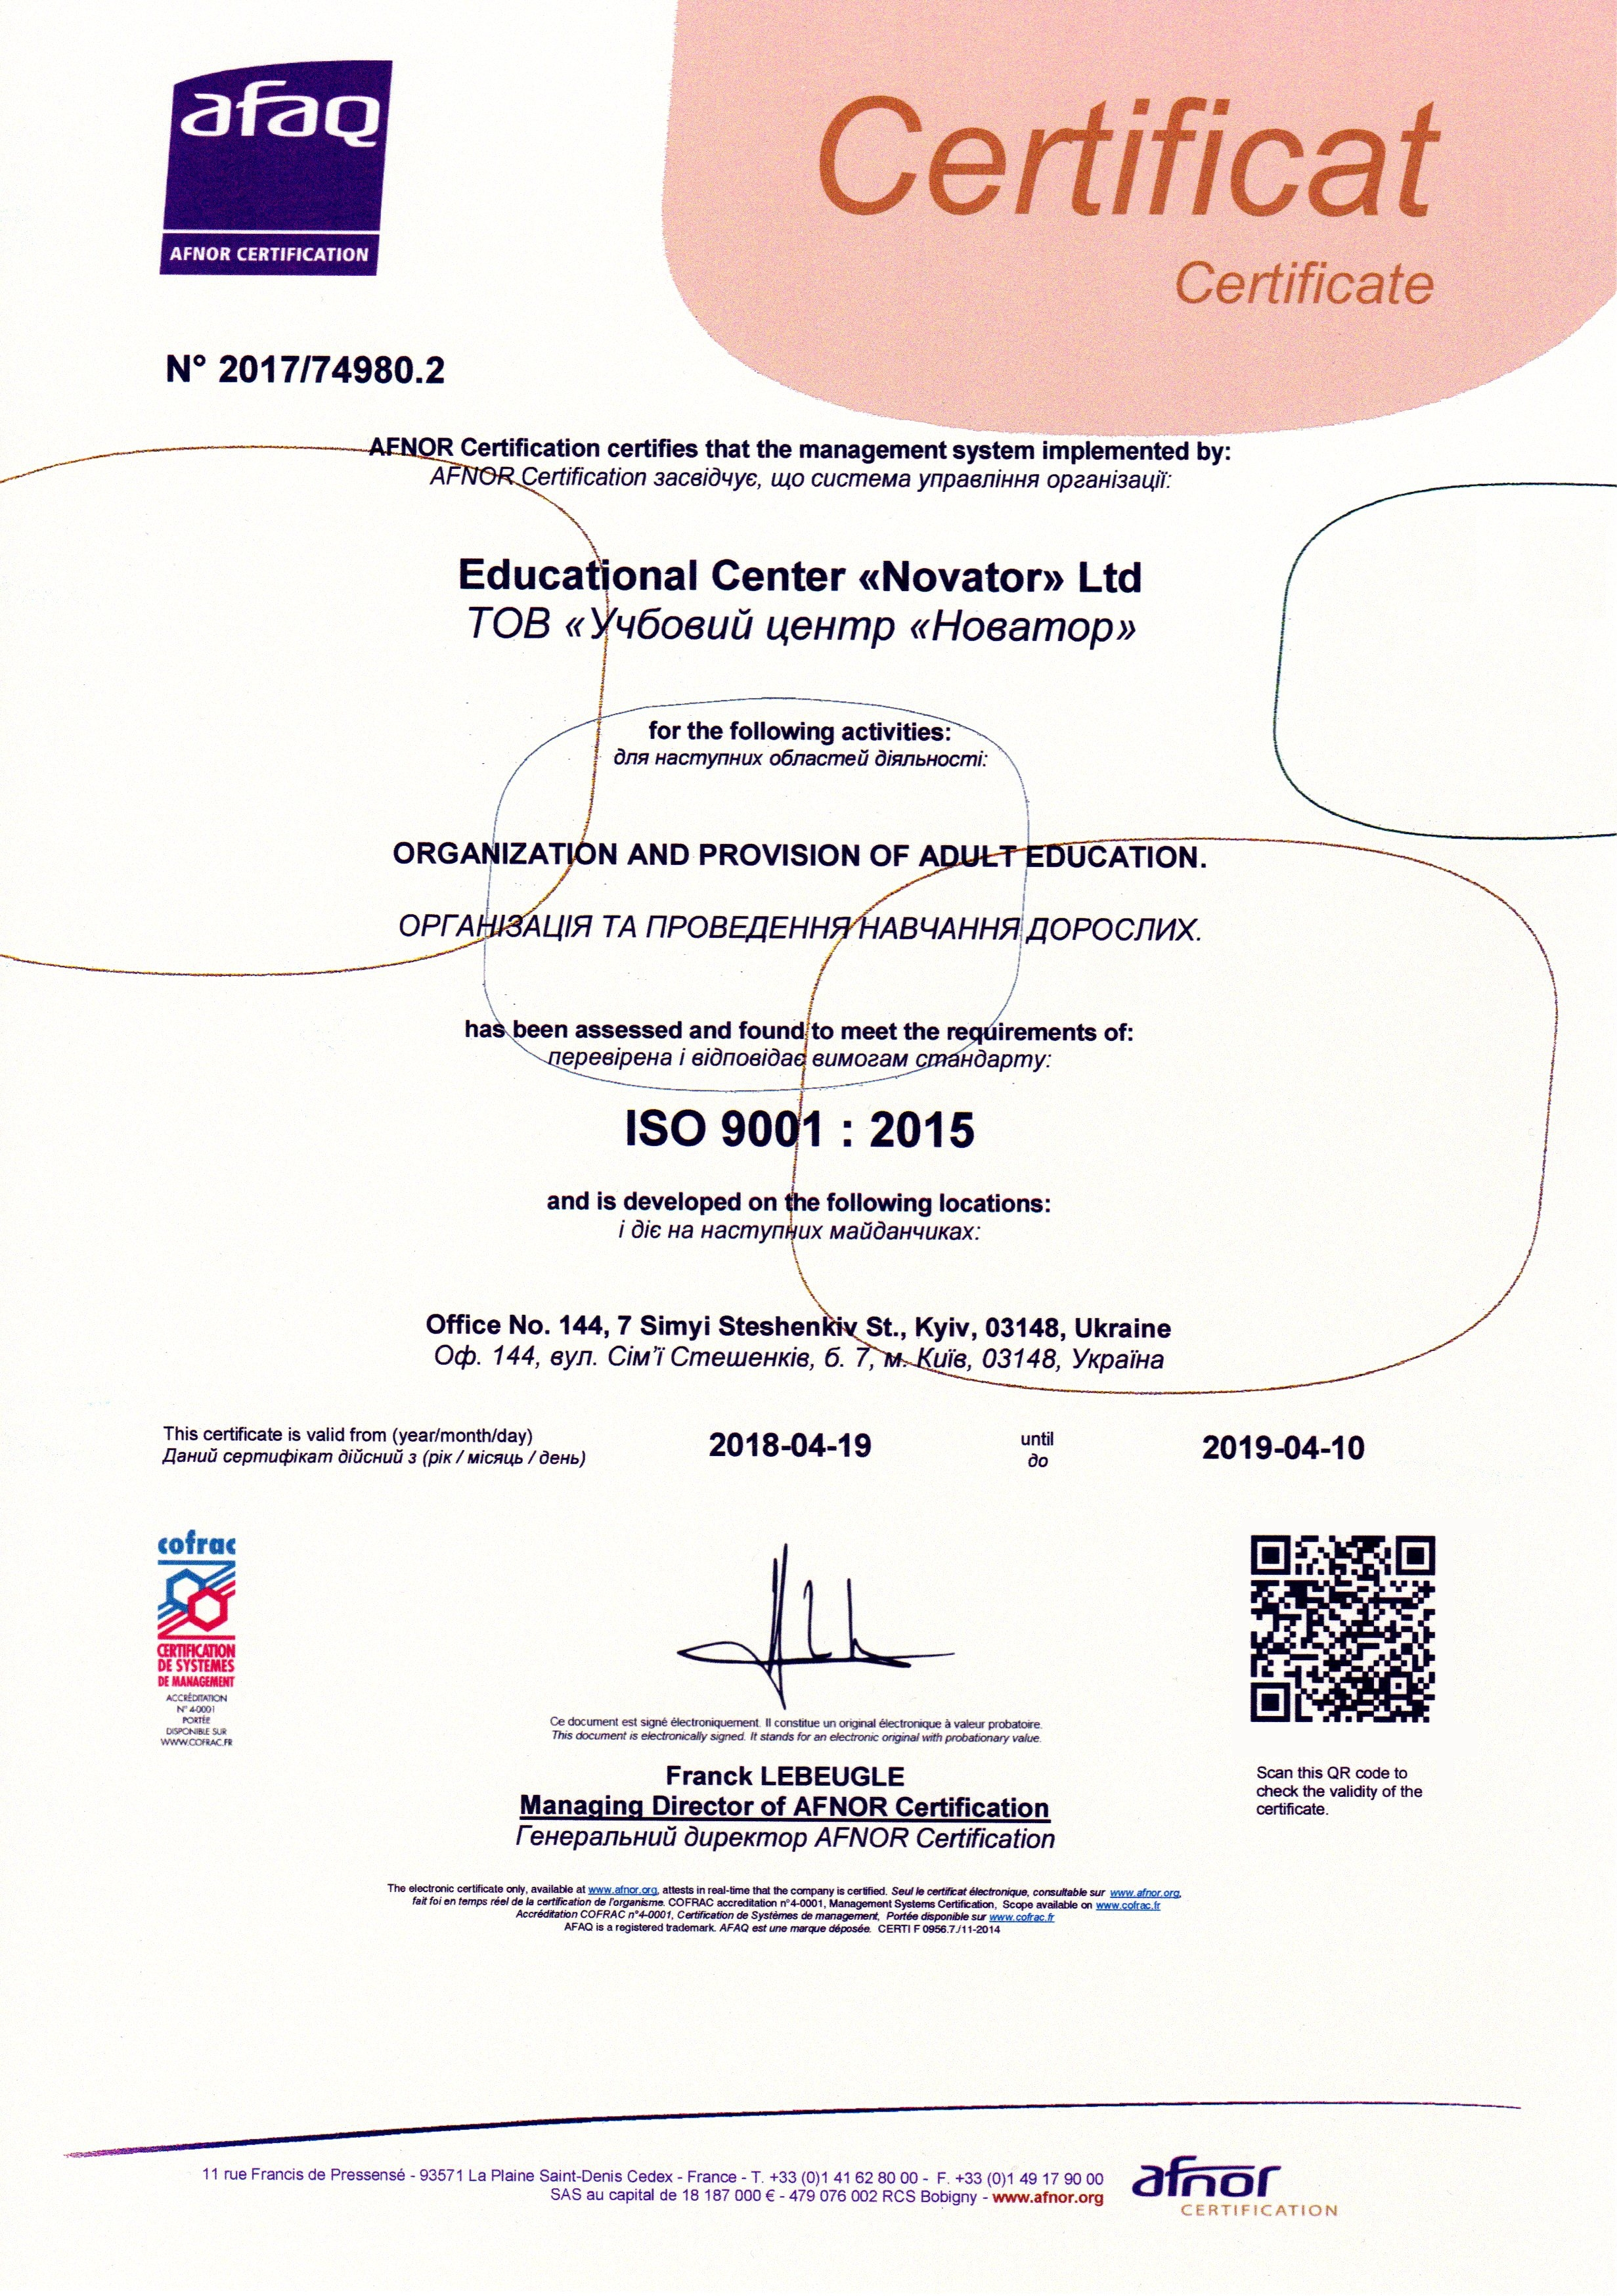 Сертификат afnor ISO 9001:2015